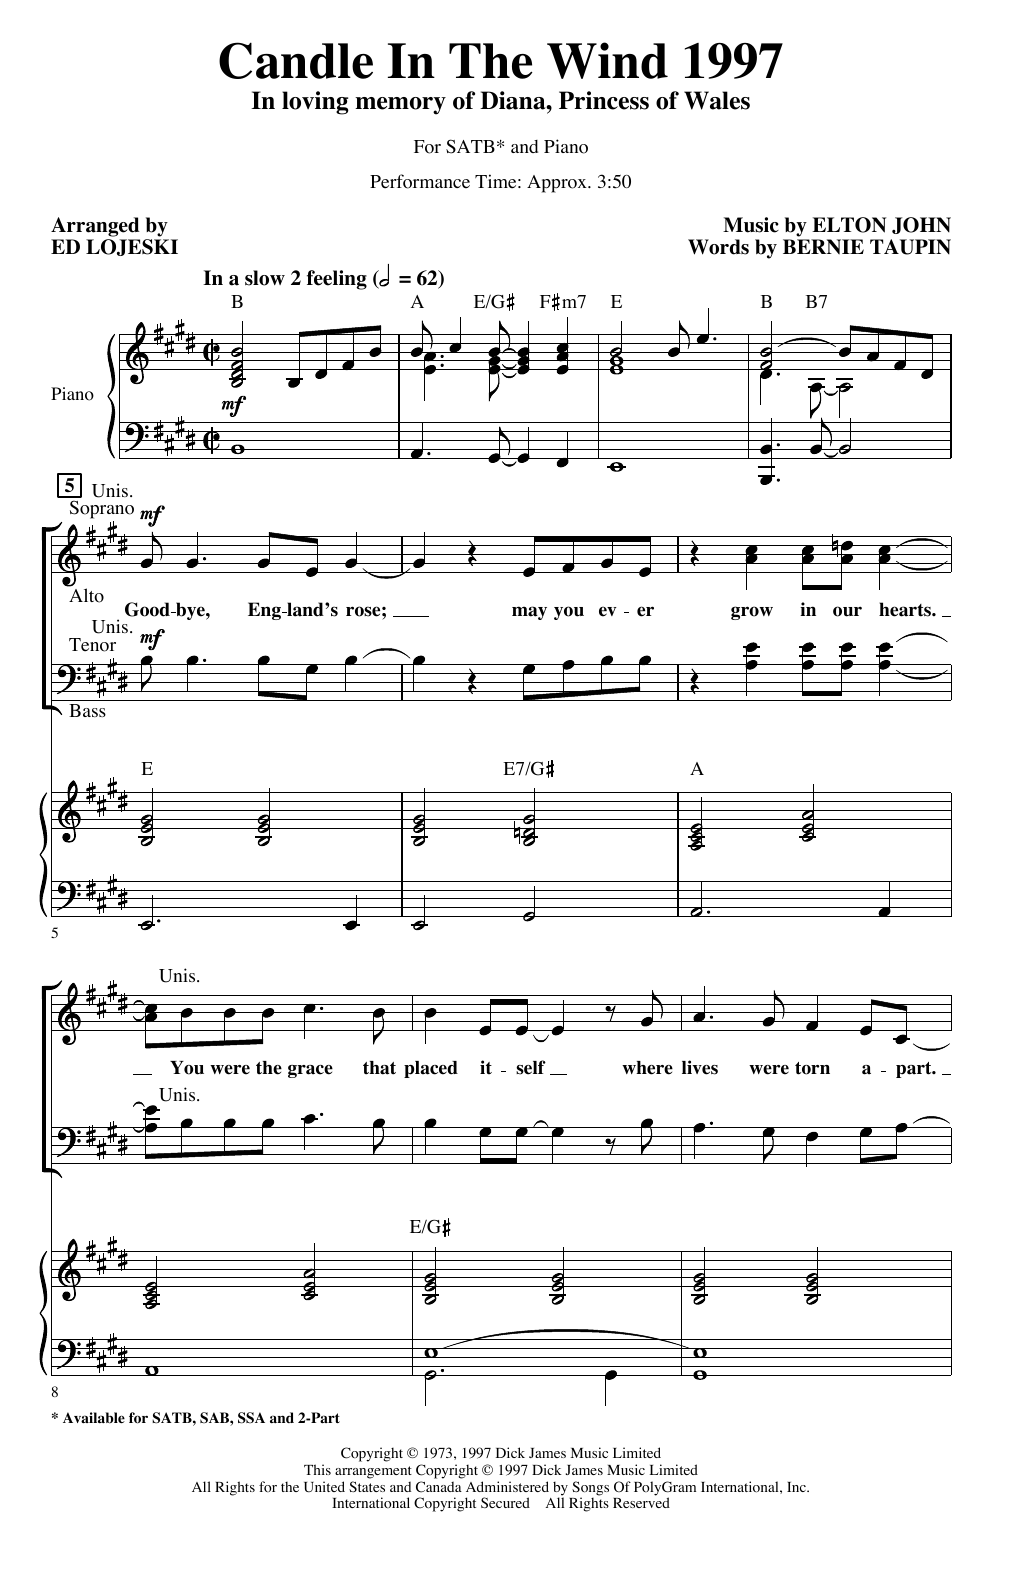 Candle In The Wind (arr. Ed Lojeski) (SATB Choir)